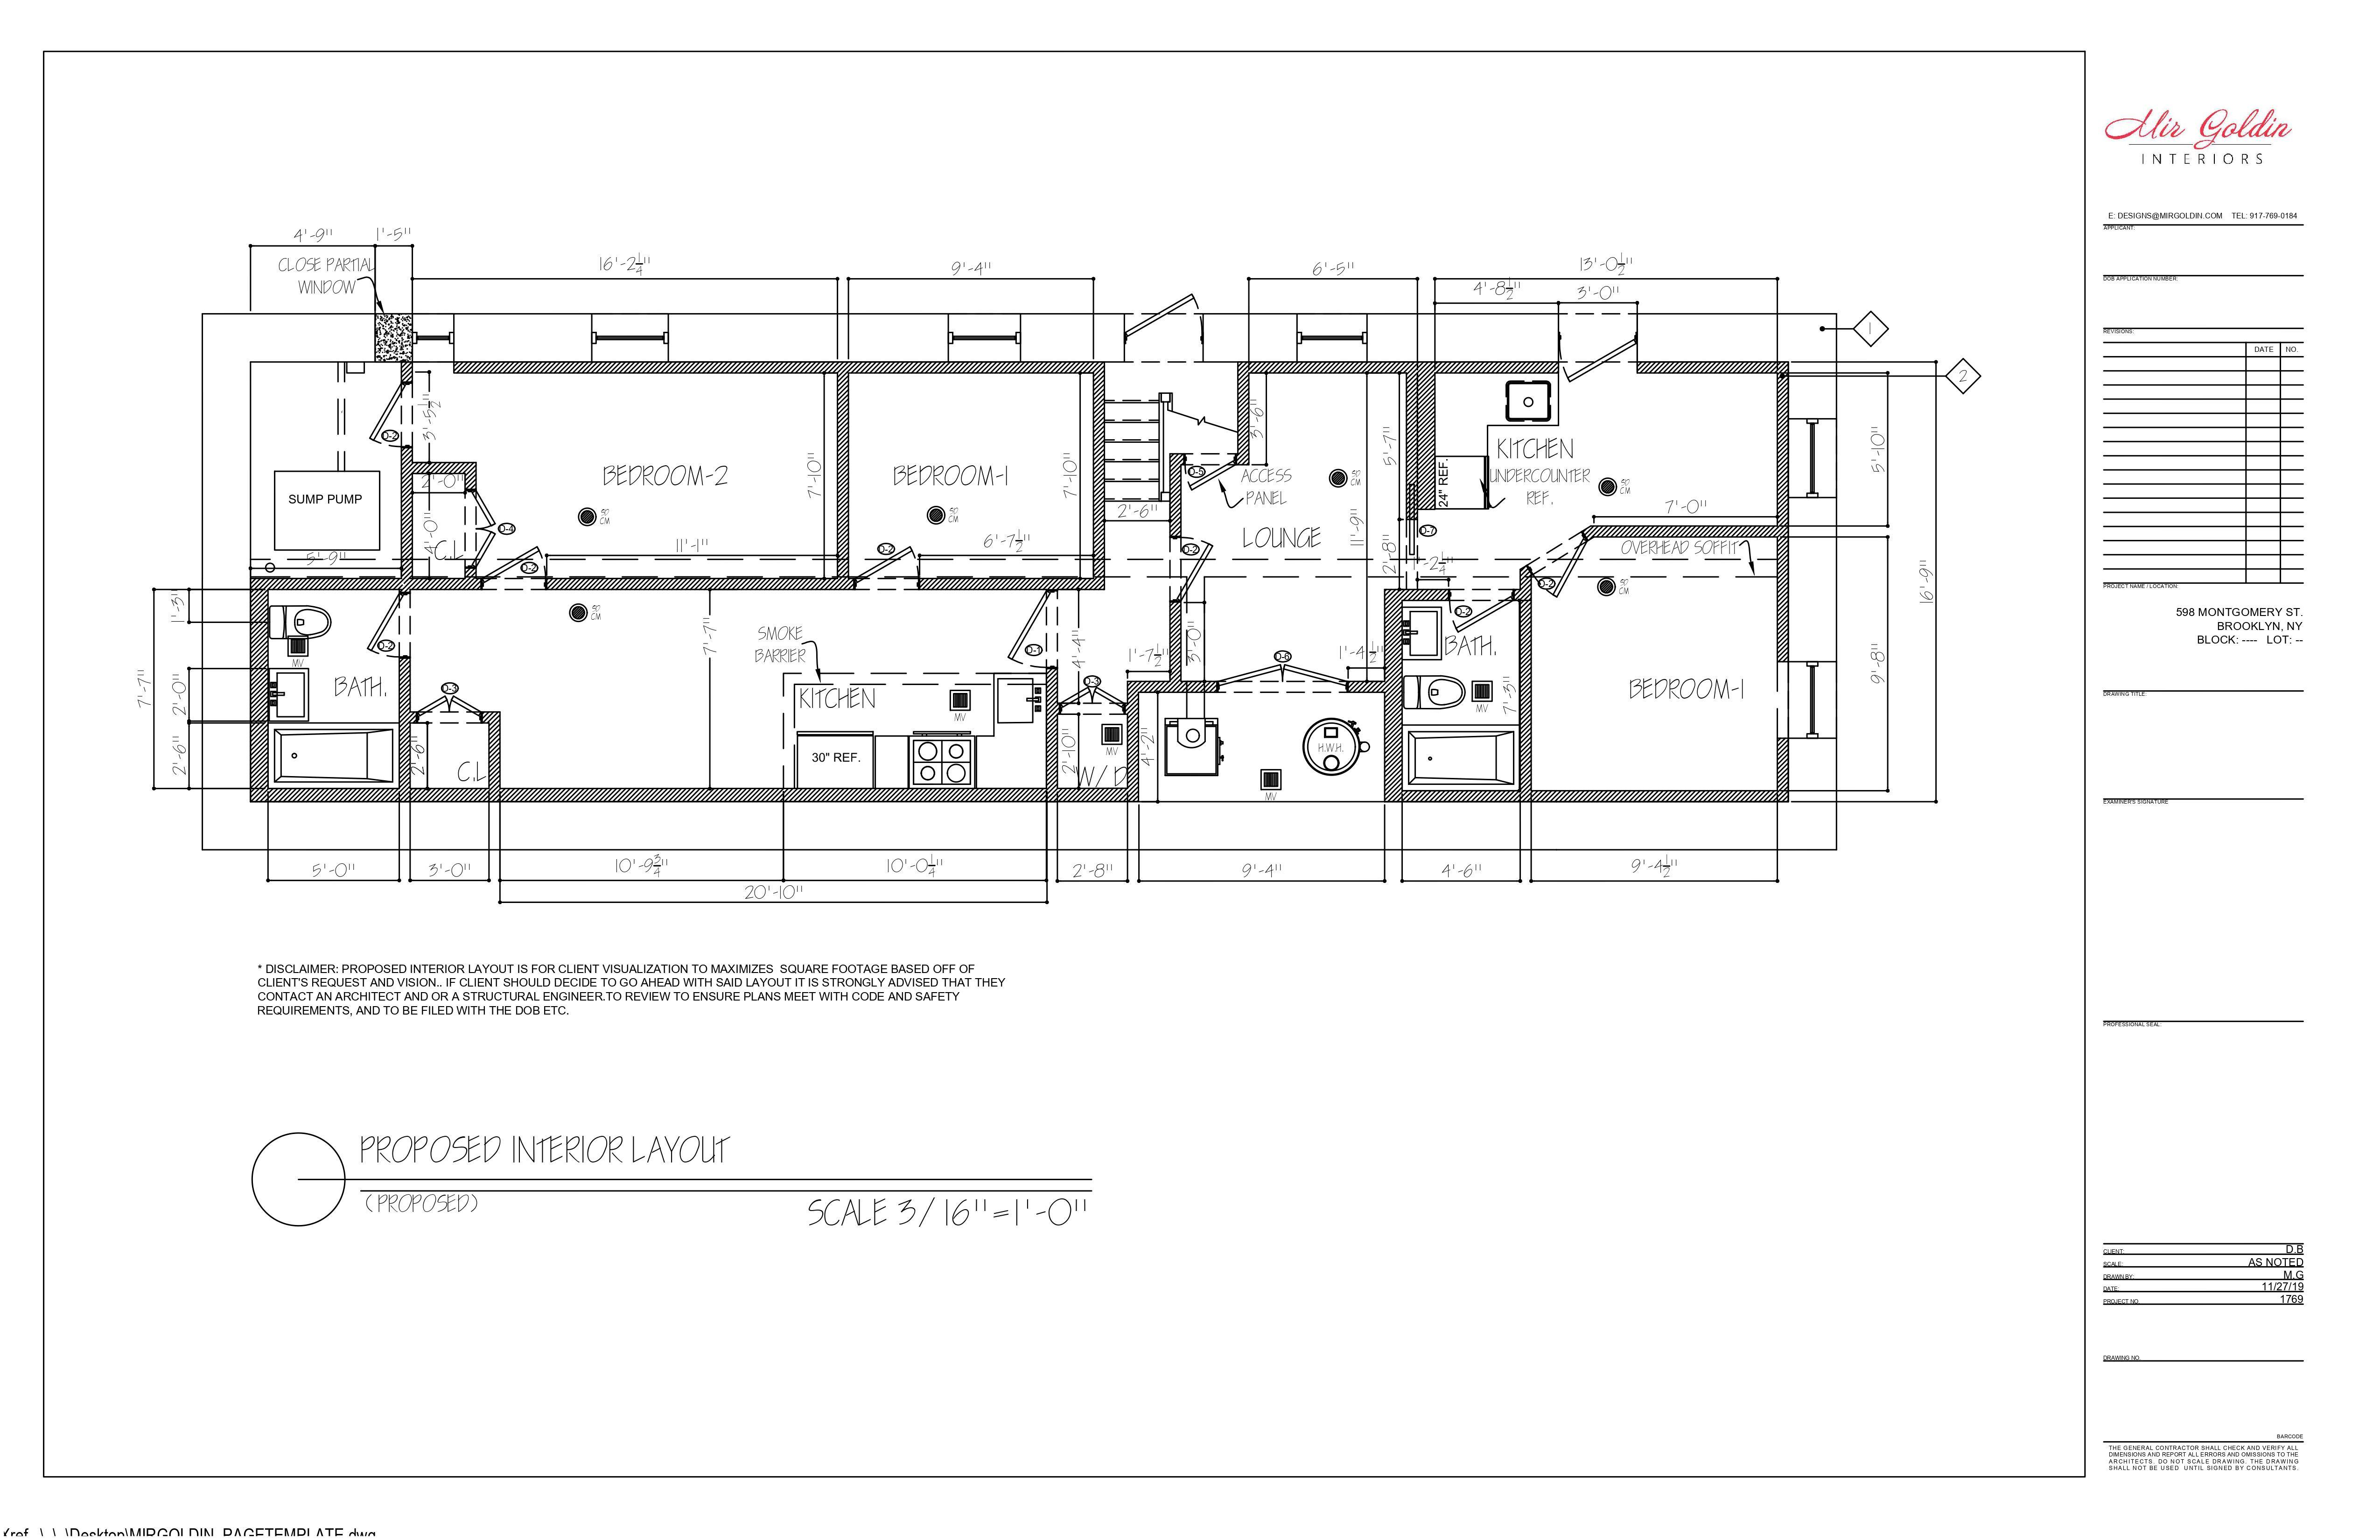 Space planning drawings